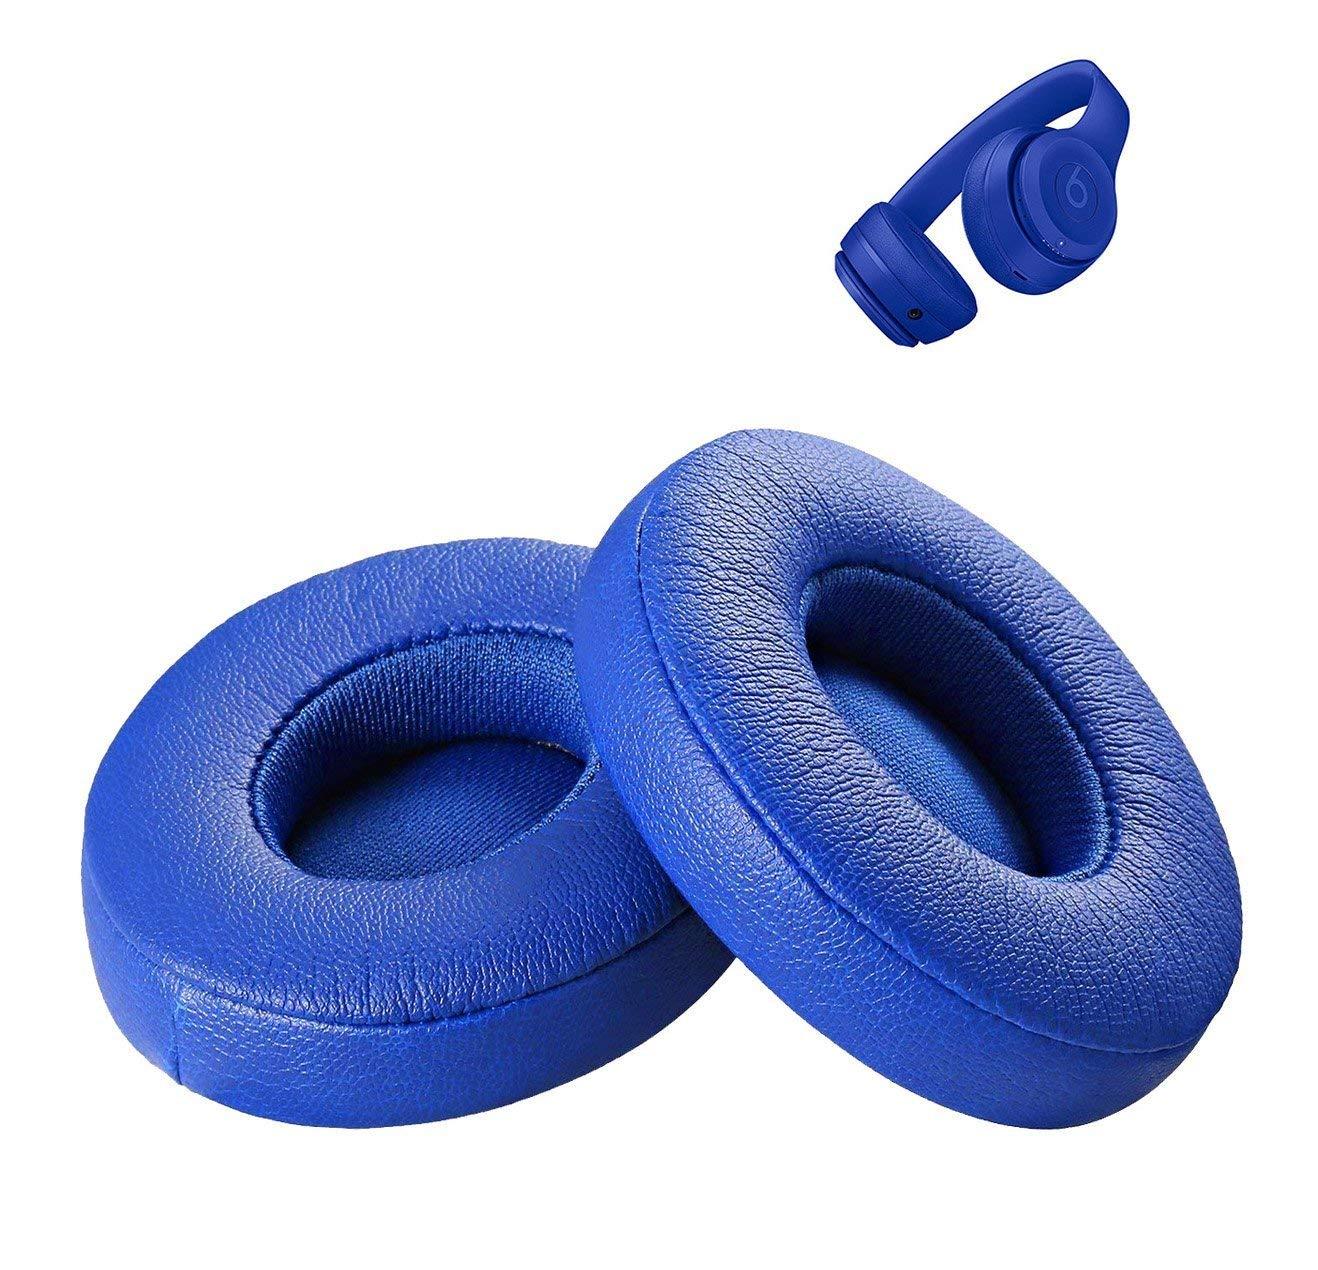 Solo3 Wireless Ear Pad Ear Pads Muffs Cushions Repair Part For Solo 3 Wireless On-Ear Headphone (Blue)